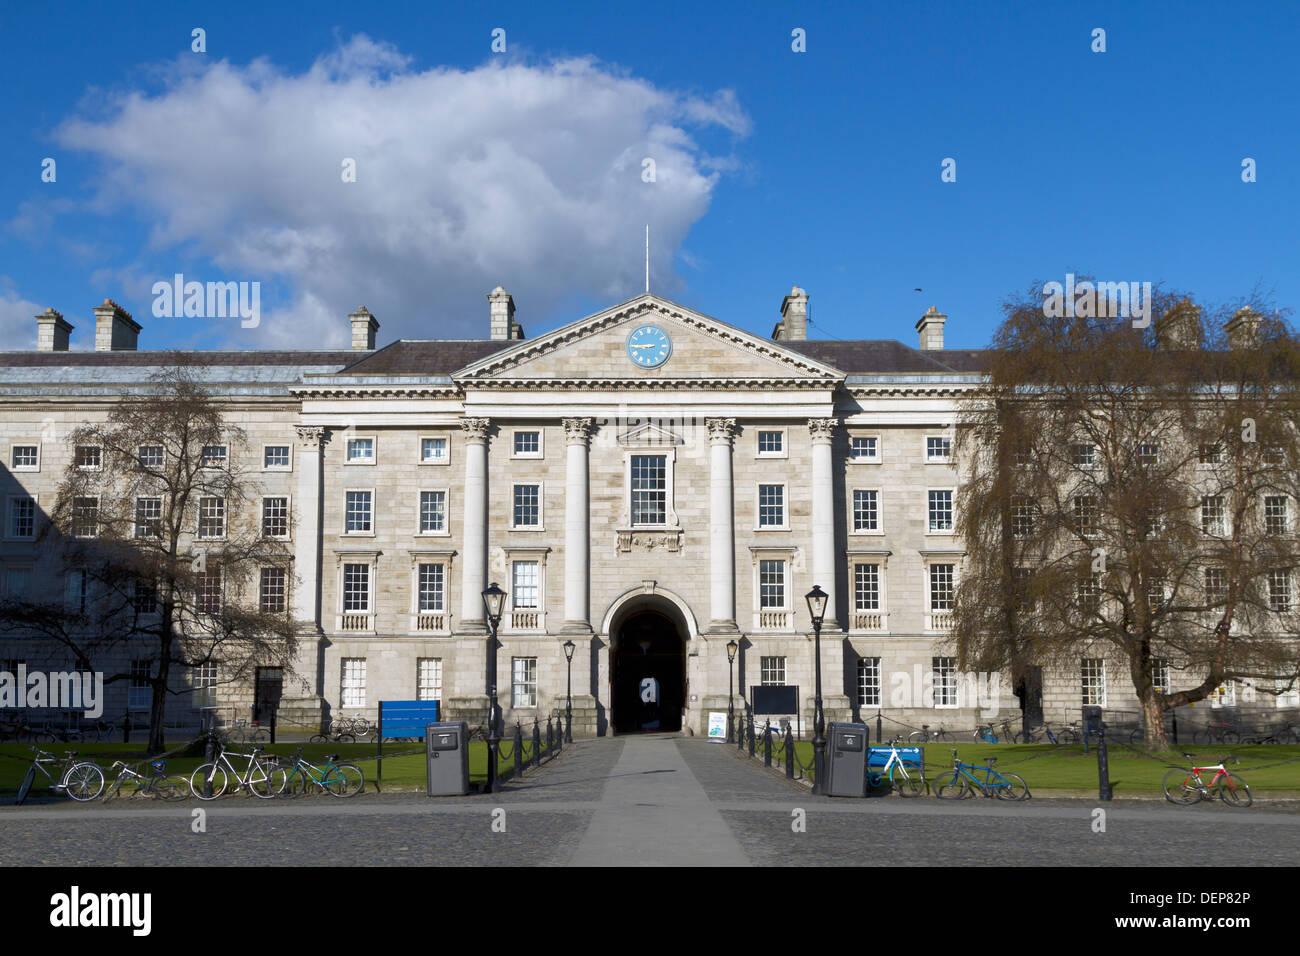 Trinity College in Dublin Ireland - Stock Image